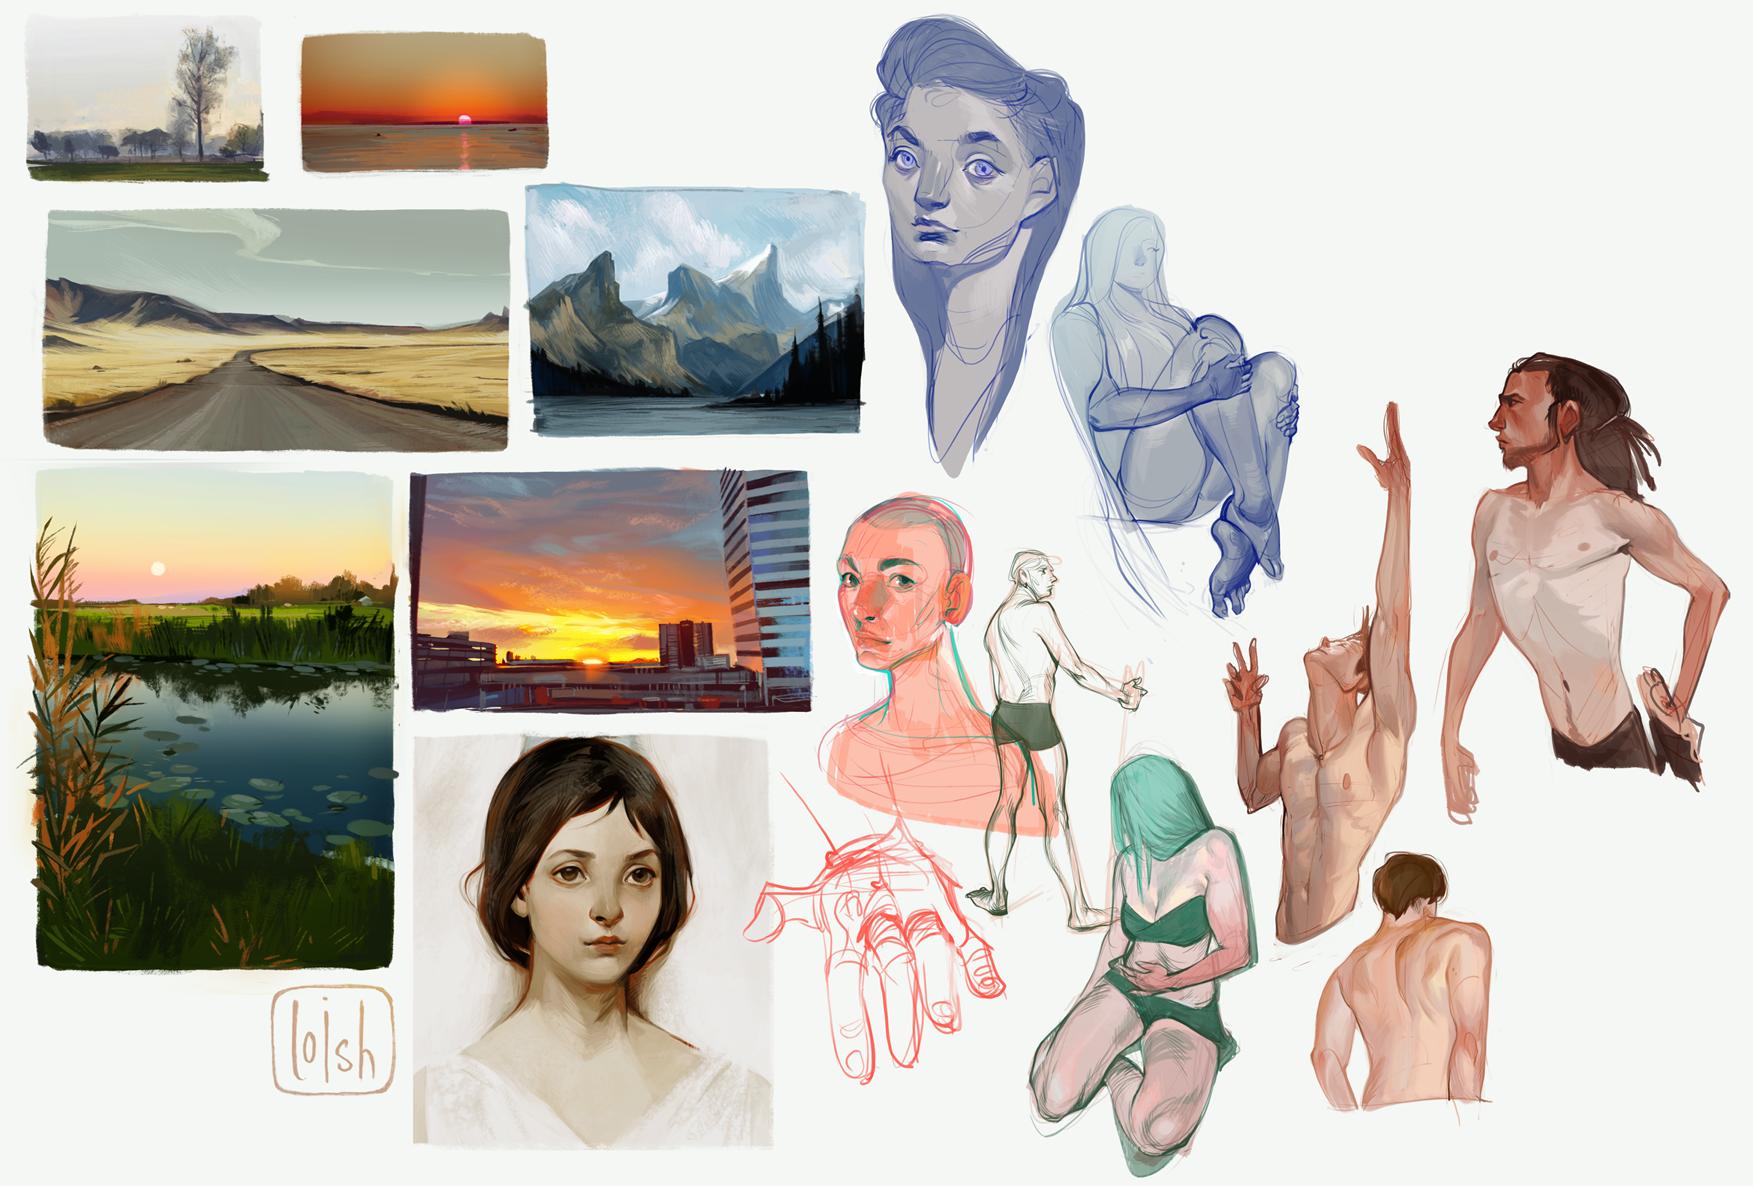 sketchdump 10 by loish